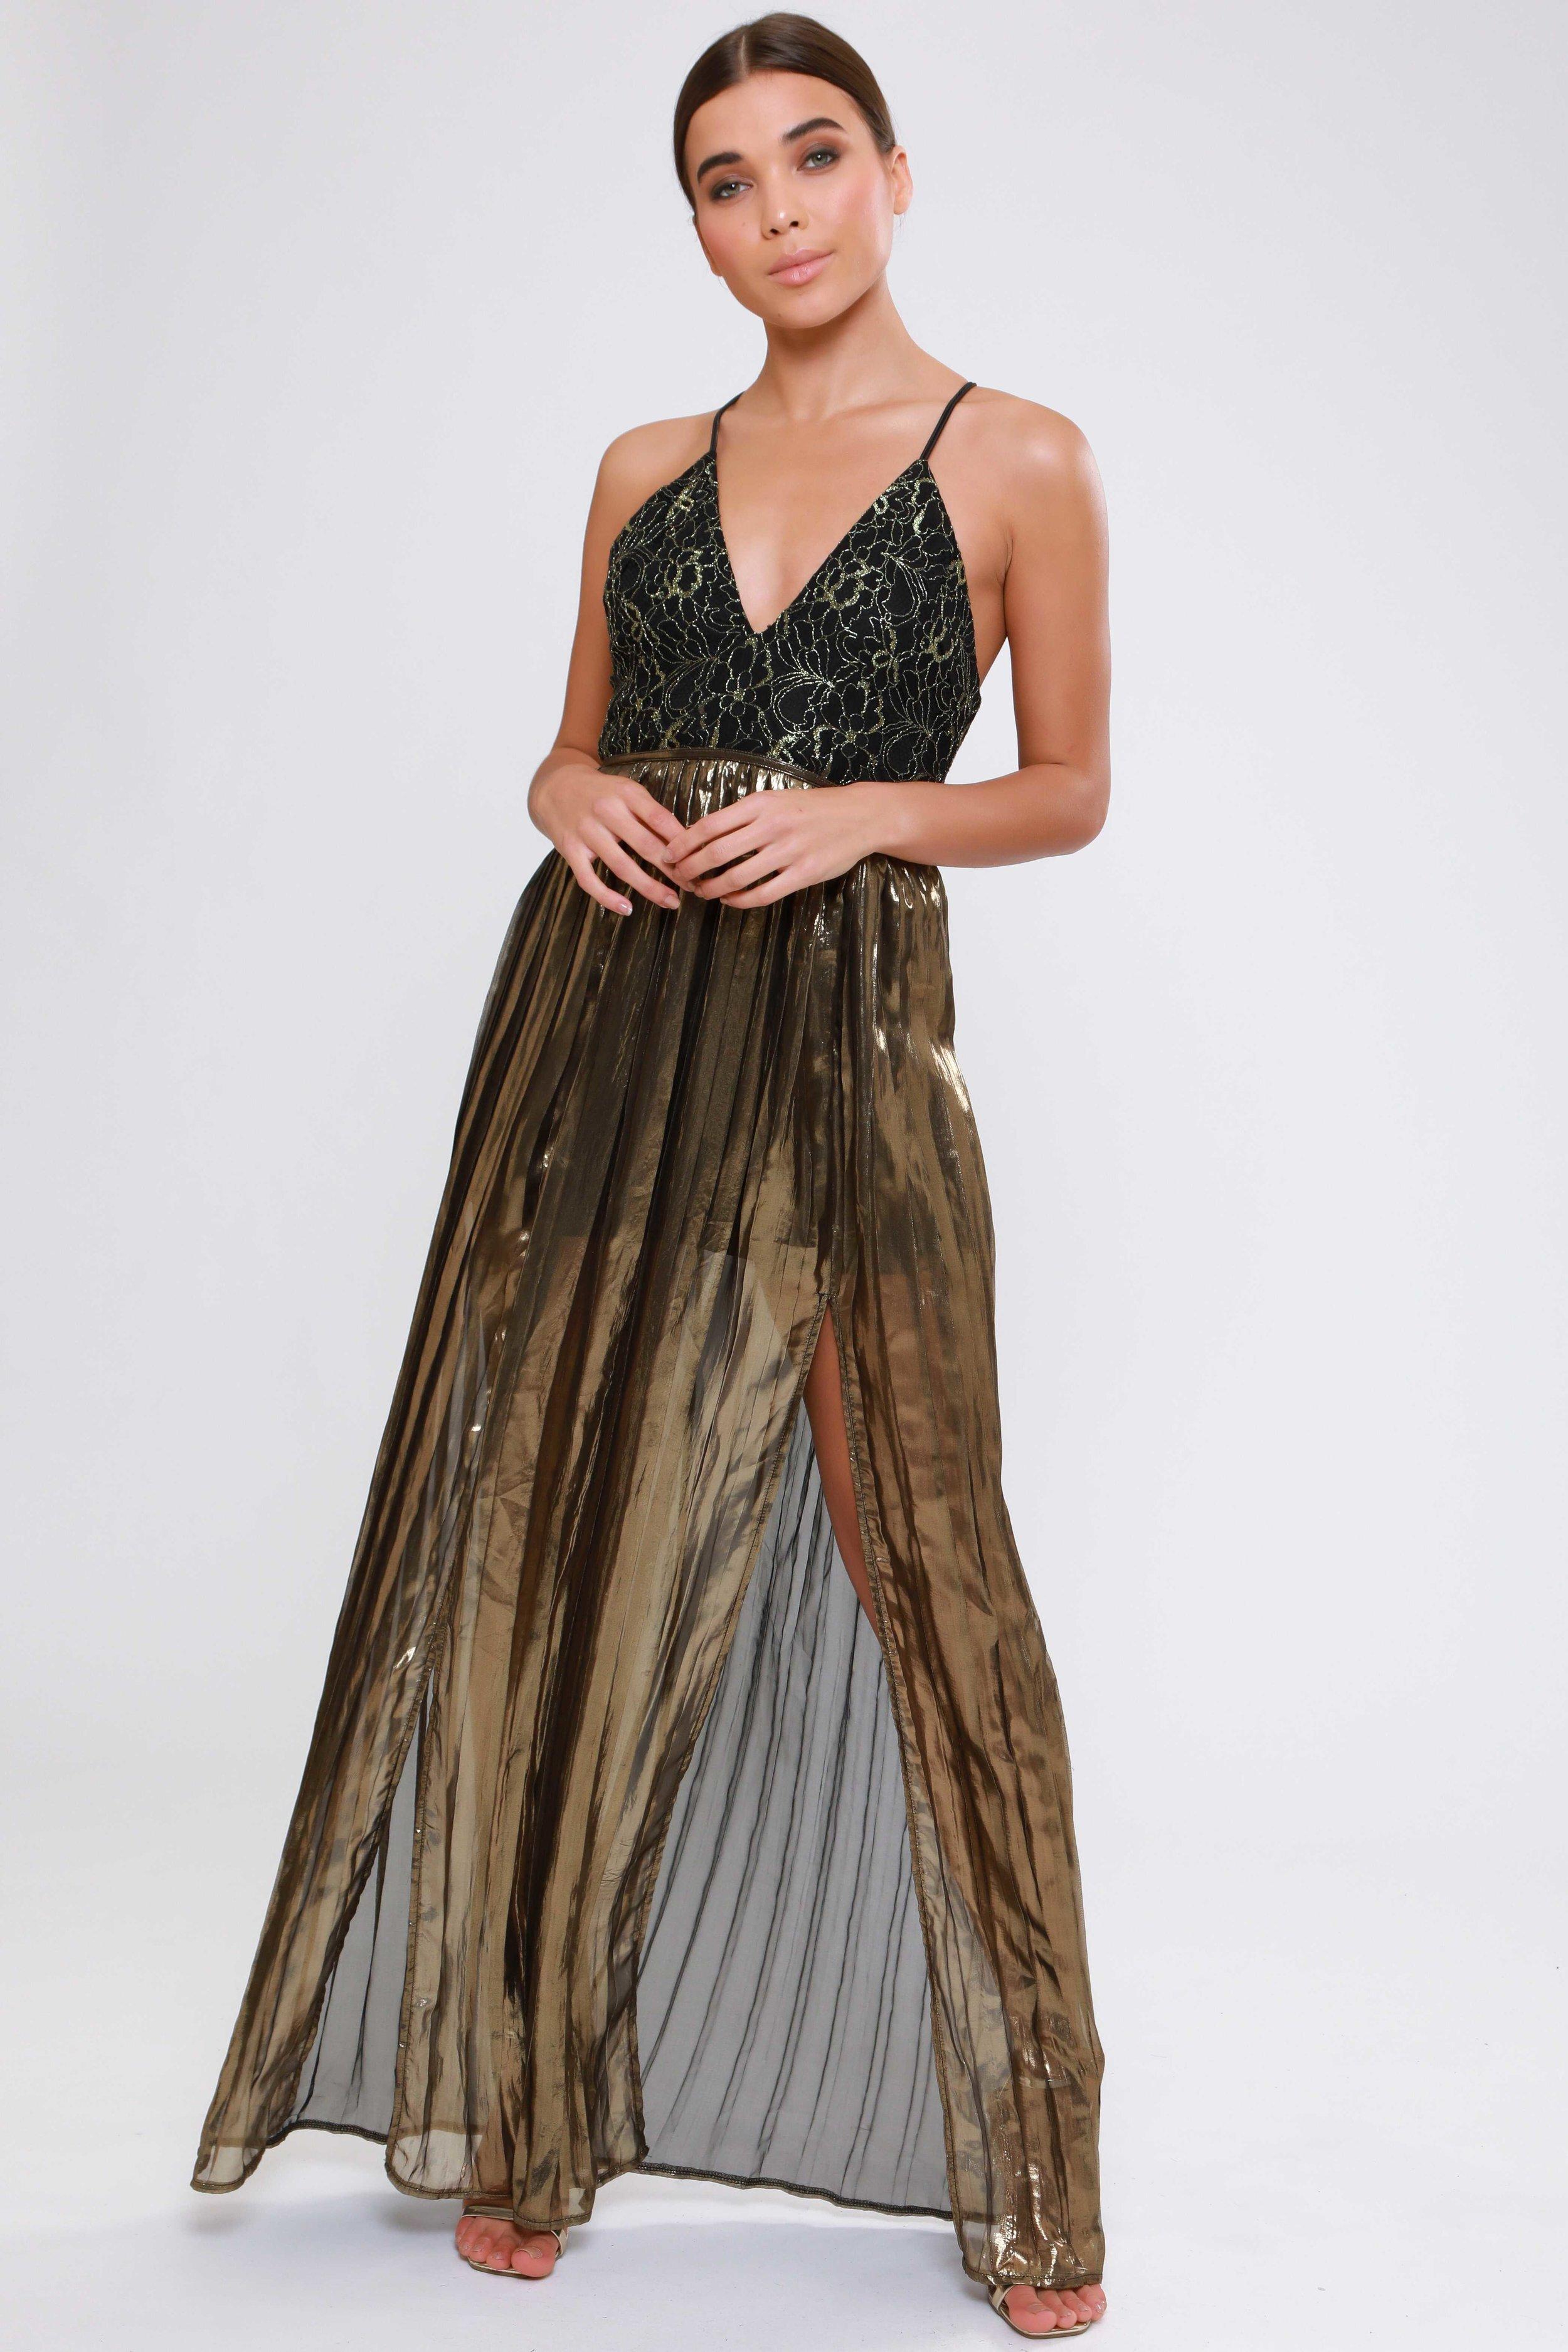 Metallic Lace  Tutu Dress   £69.00